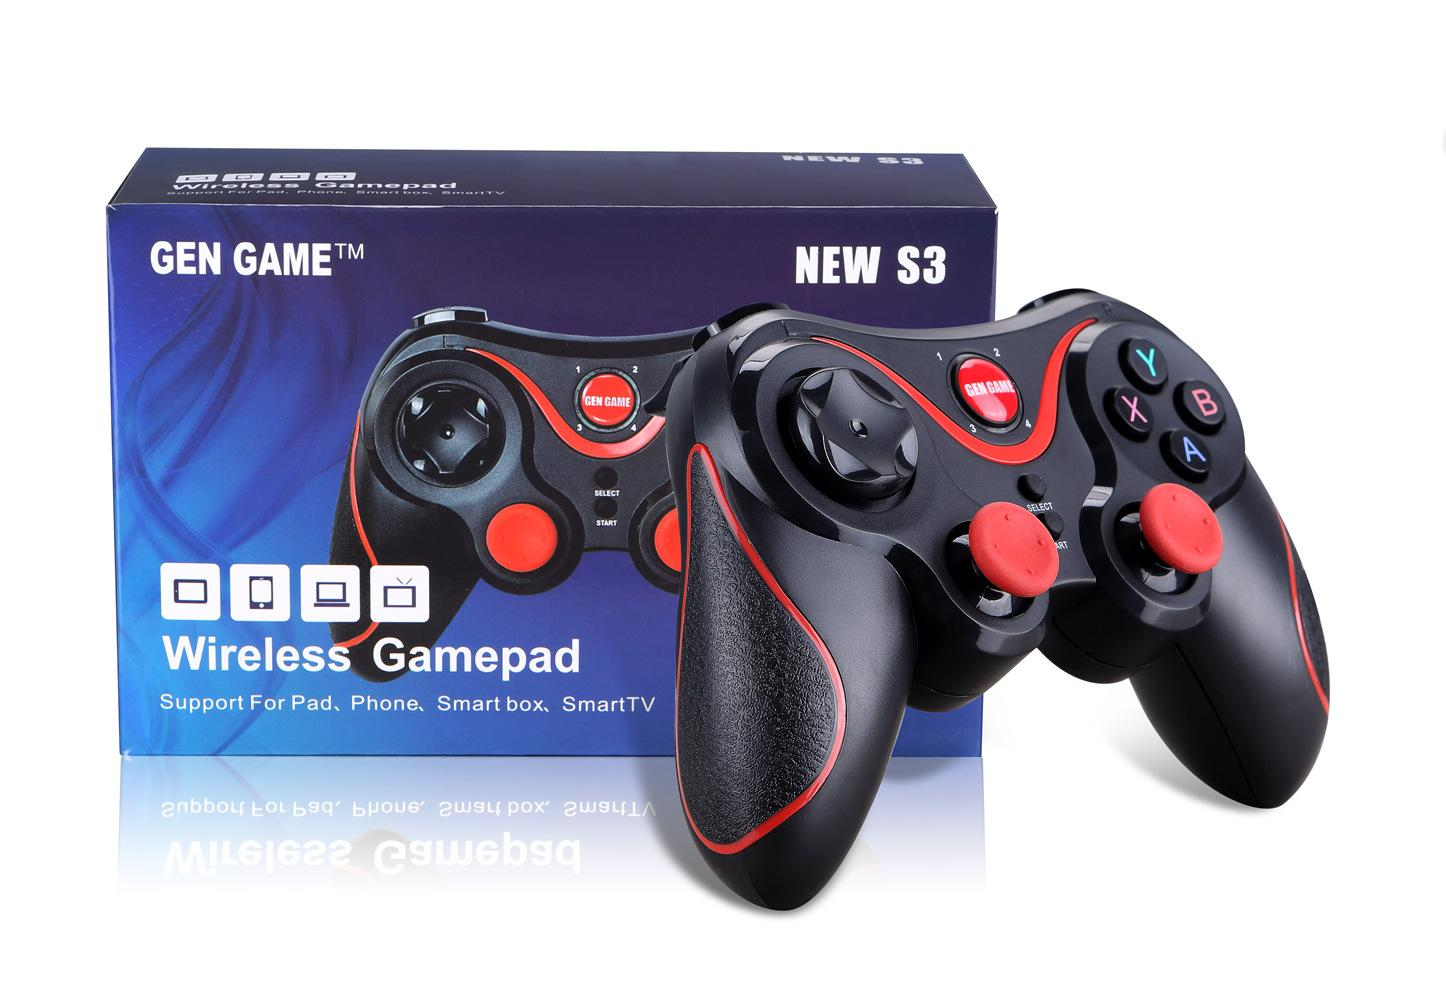 iPega PG 9077 무선 블루투스 게임 패드 2.4G 브래킷 조이스틱 Android Win 게임 콘솔 플레이어 스마트 폰 PS3